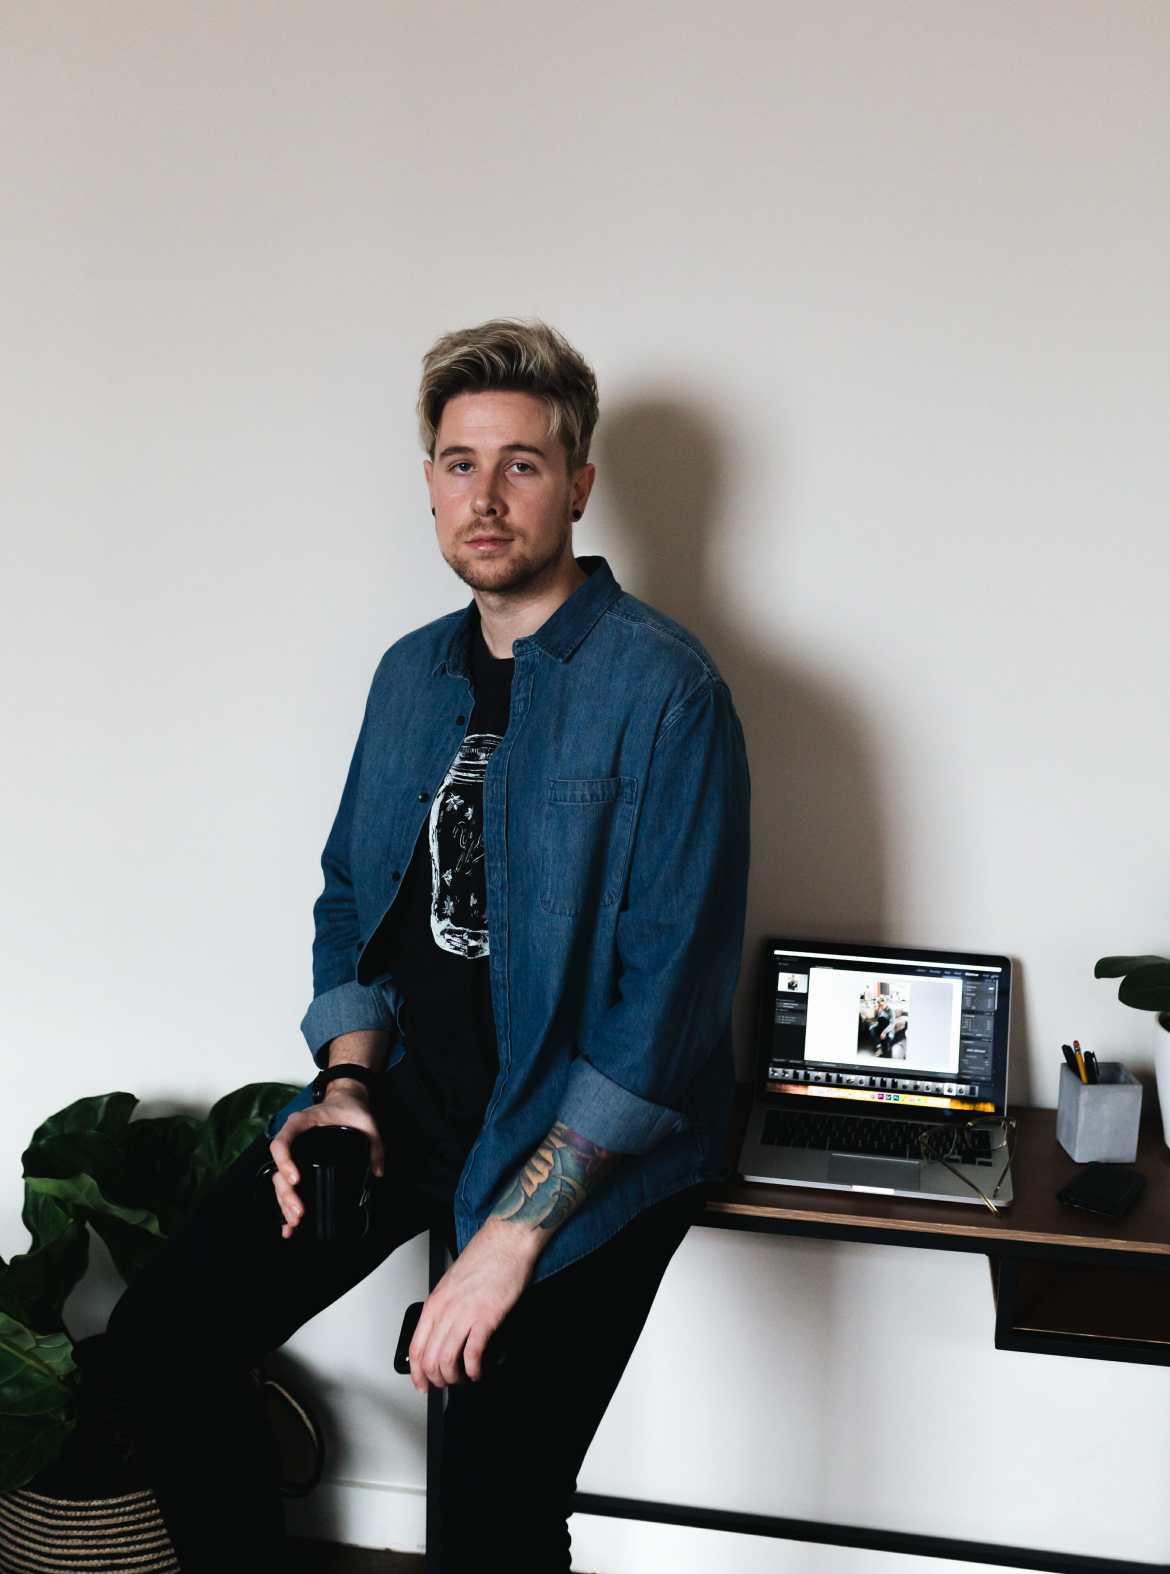 man sitting on desk